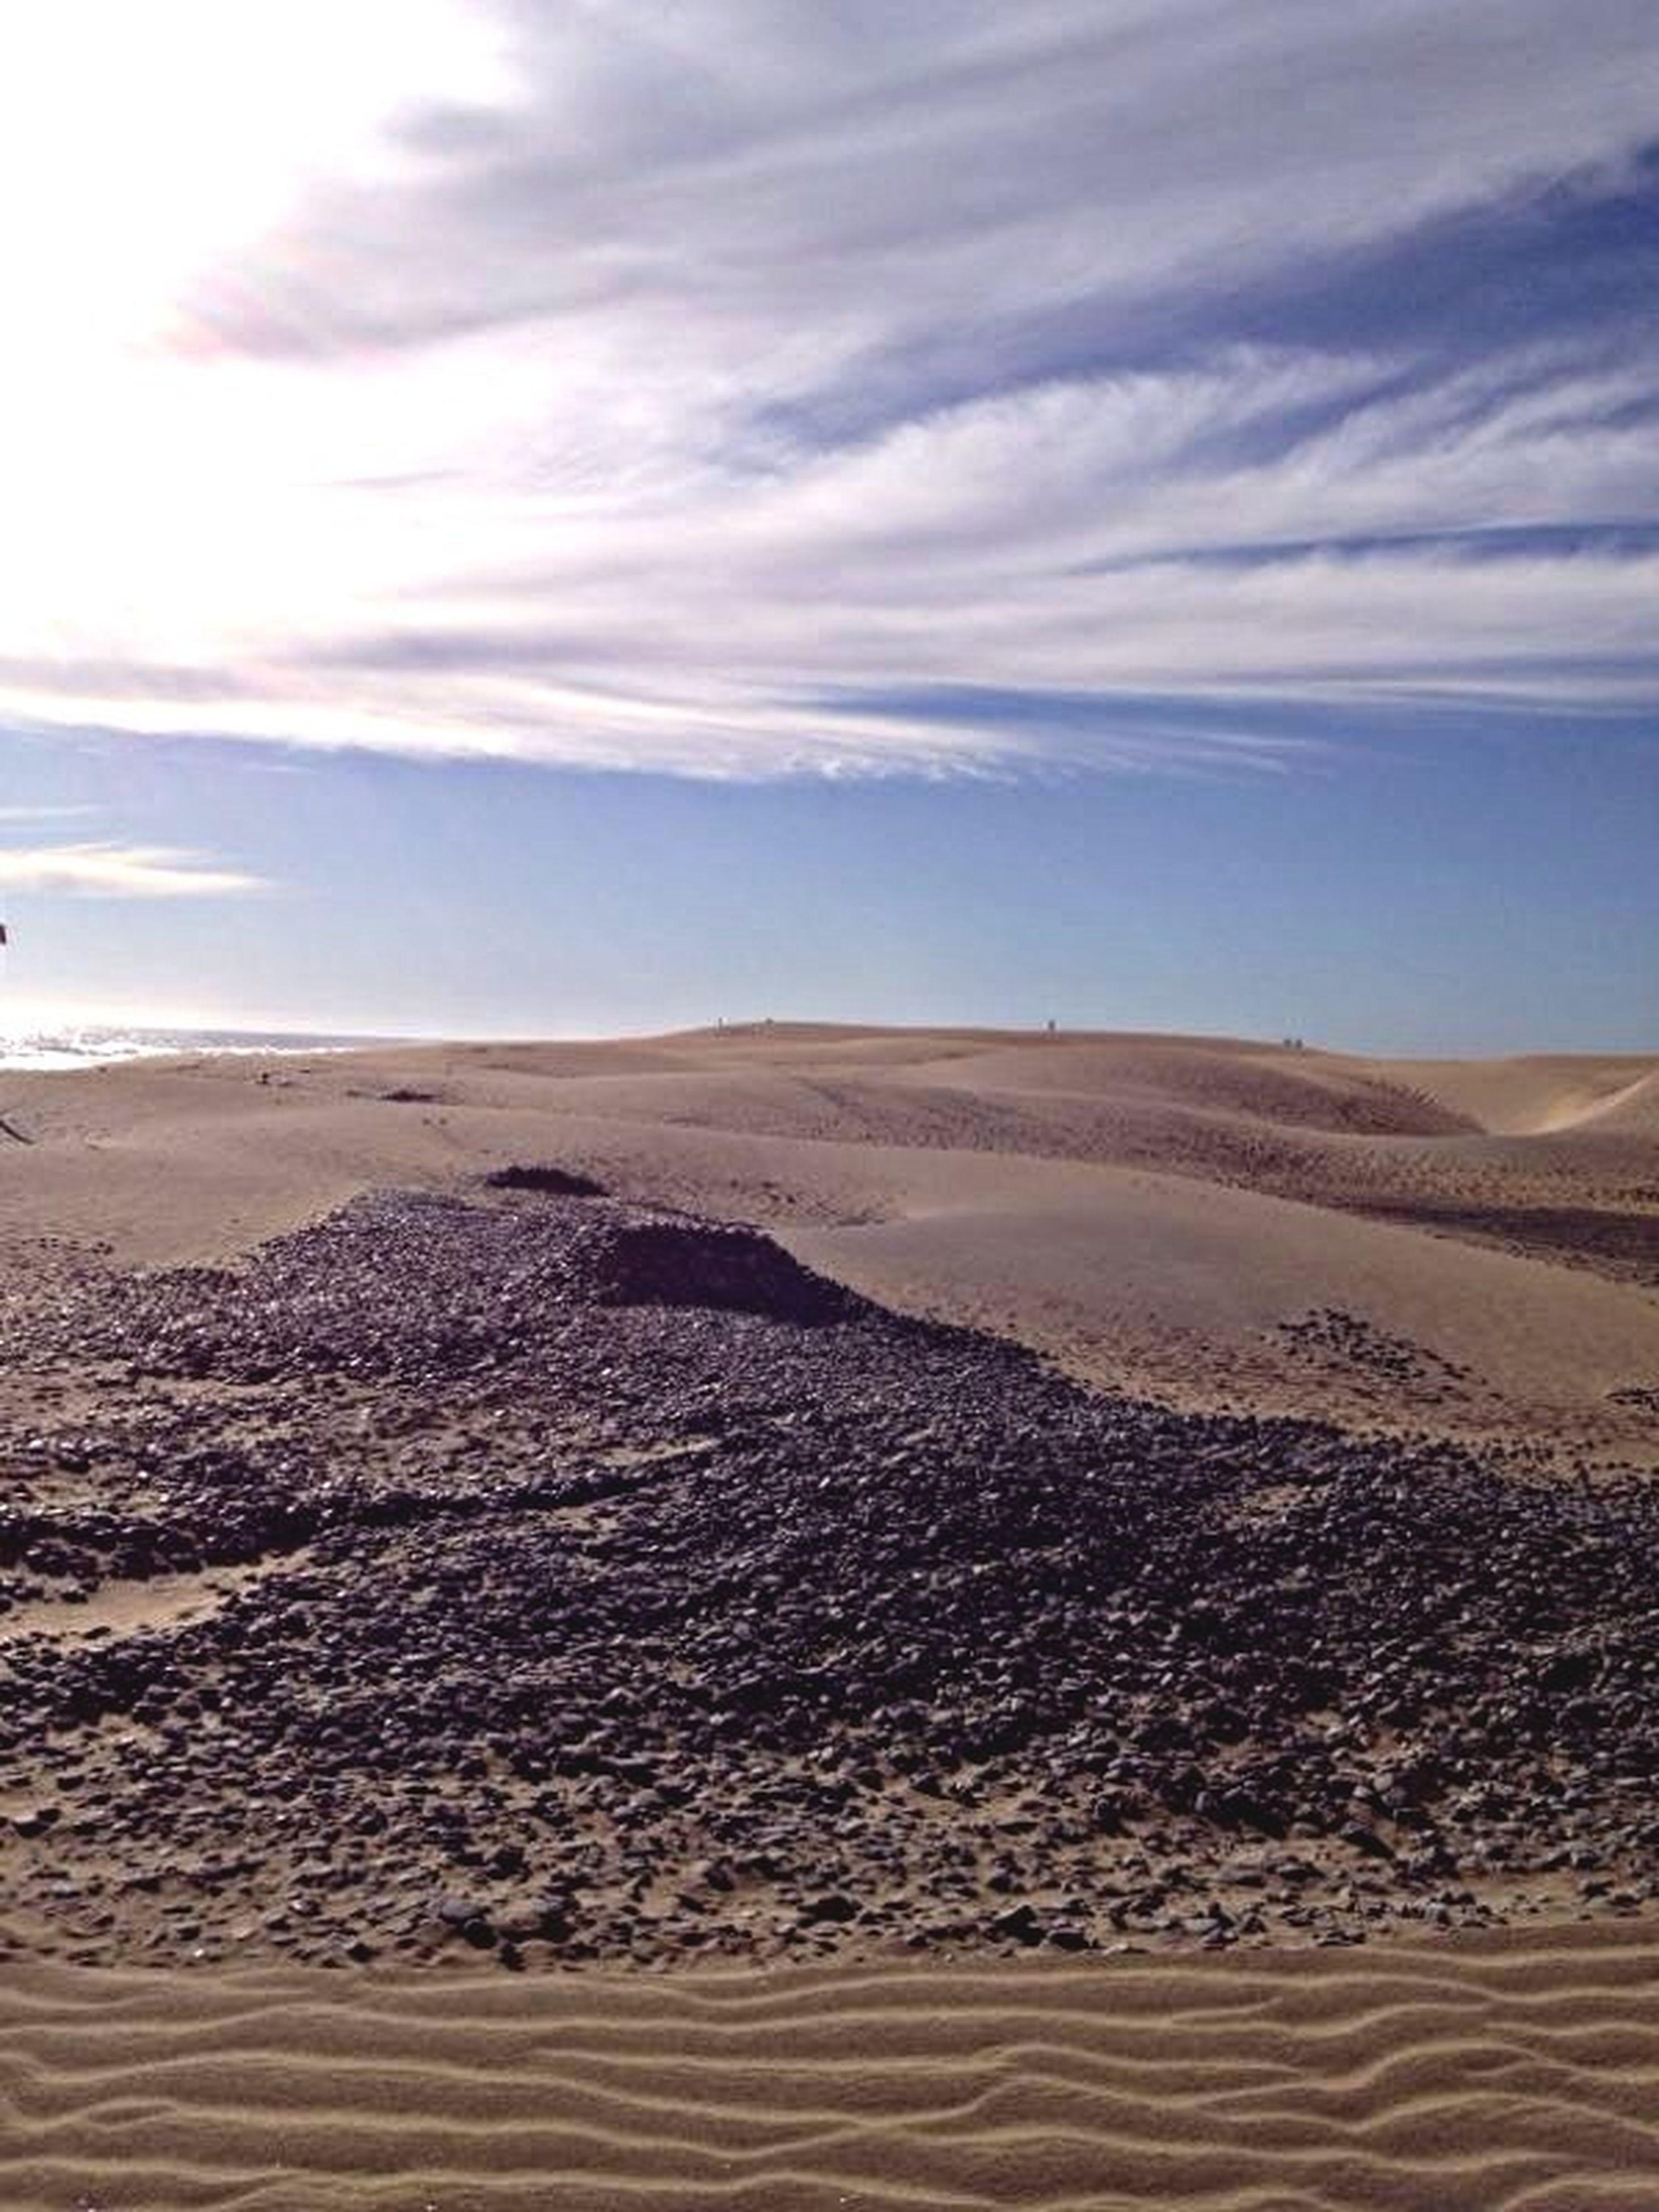 sand, beach, tranquil scene, tranquility, scenics, sky, sea, beauty in nature, sand dune, shore, desert, nature, footprint, horizon over water, idyllic, remote, landscape, water, arid climate, non-urban scene